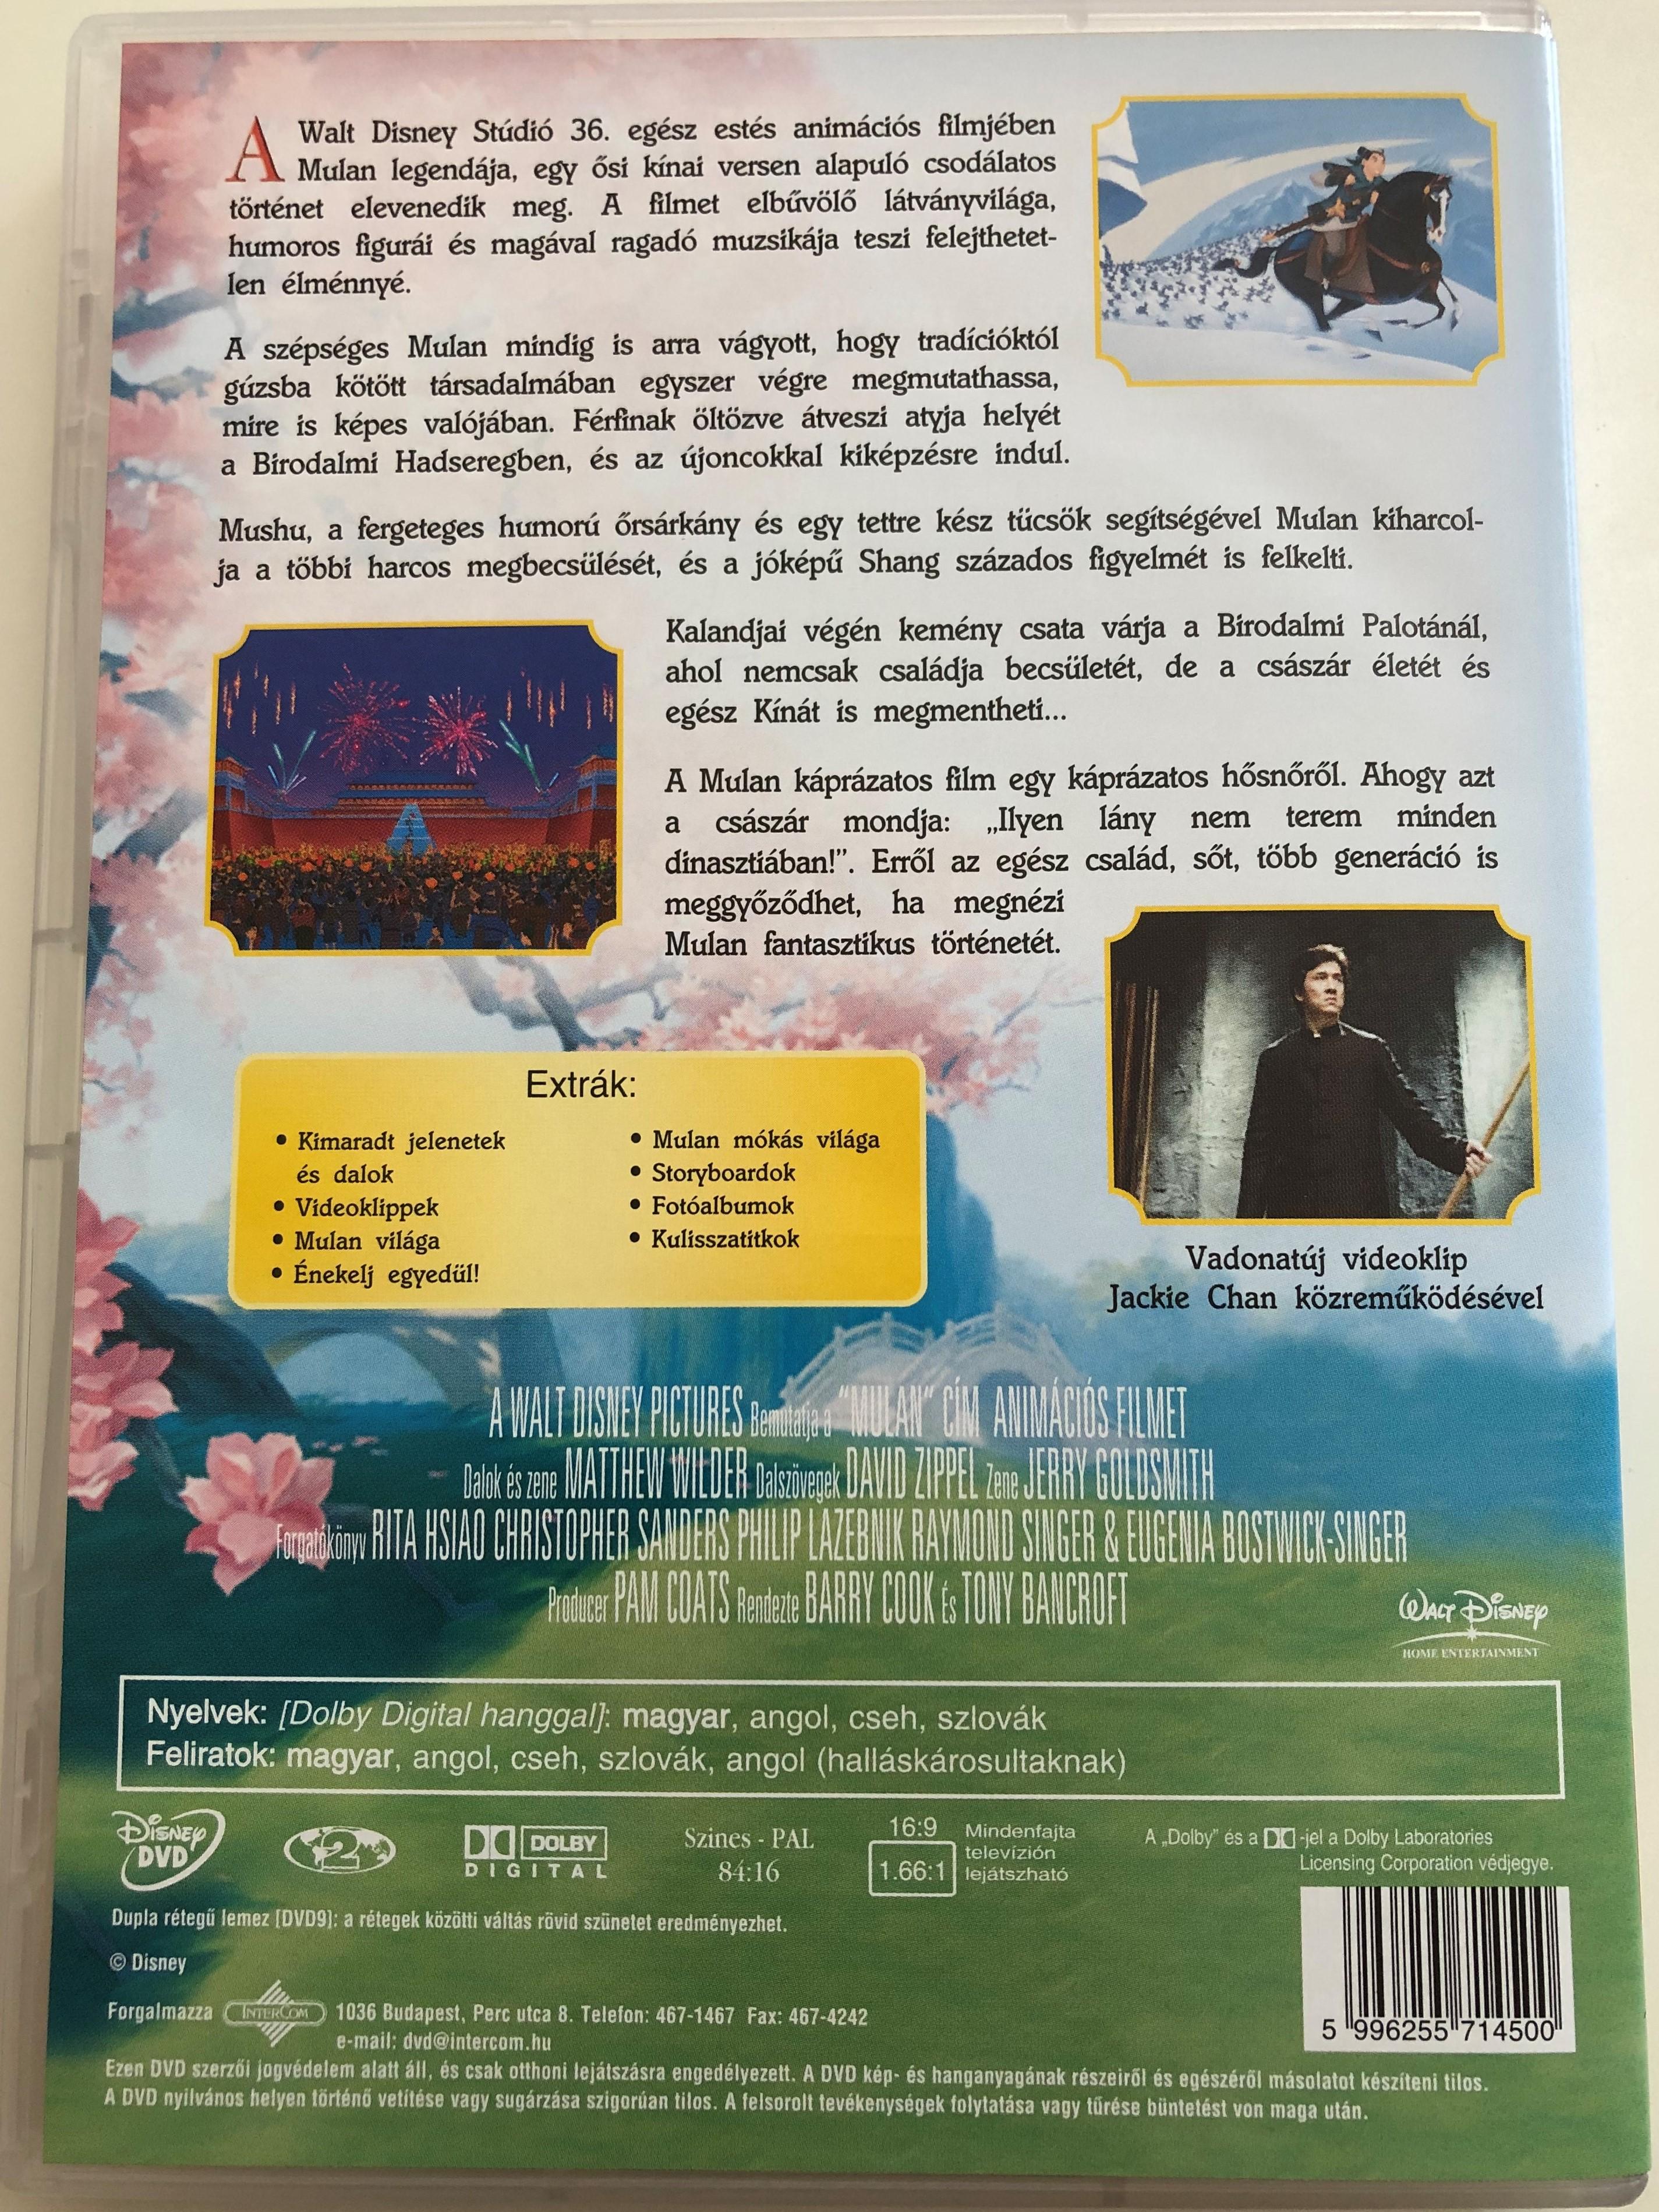 mulan-special-edition-2-dvd-1998-mulan-extra-v-ltozat-duplalemezes-extra-v-ltozat-directed-by-barry-cook-tony-bancroft-starring-ming-na-wen-eddie-murphy-bd-wong-miguel-ferrer-june-foray-4-.jpg